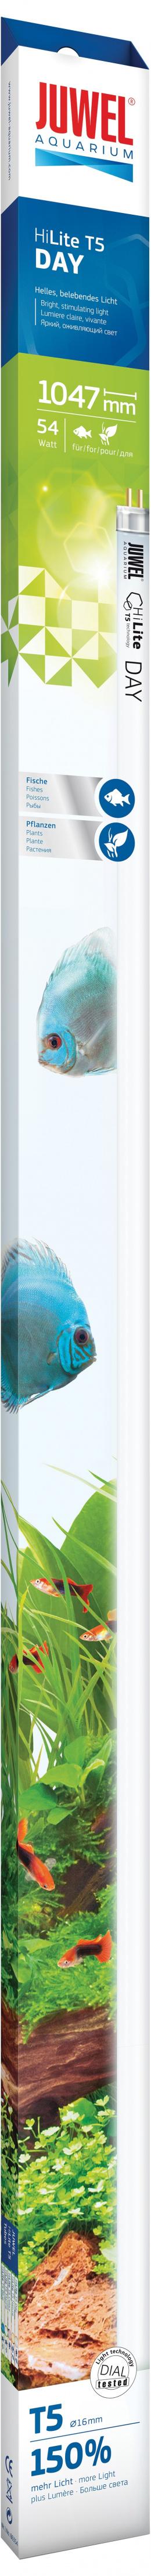 Lampa akvārijam - High-Lite Day T5 54W 1047mm